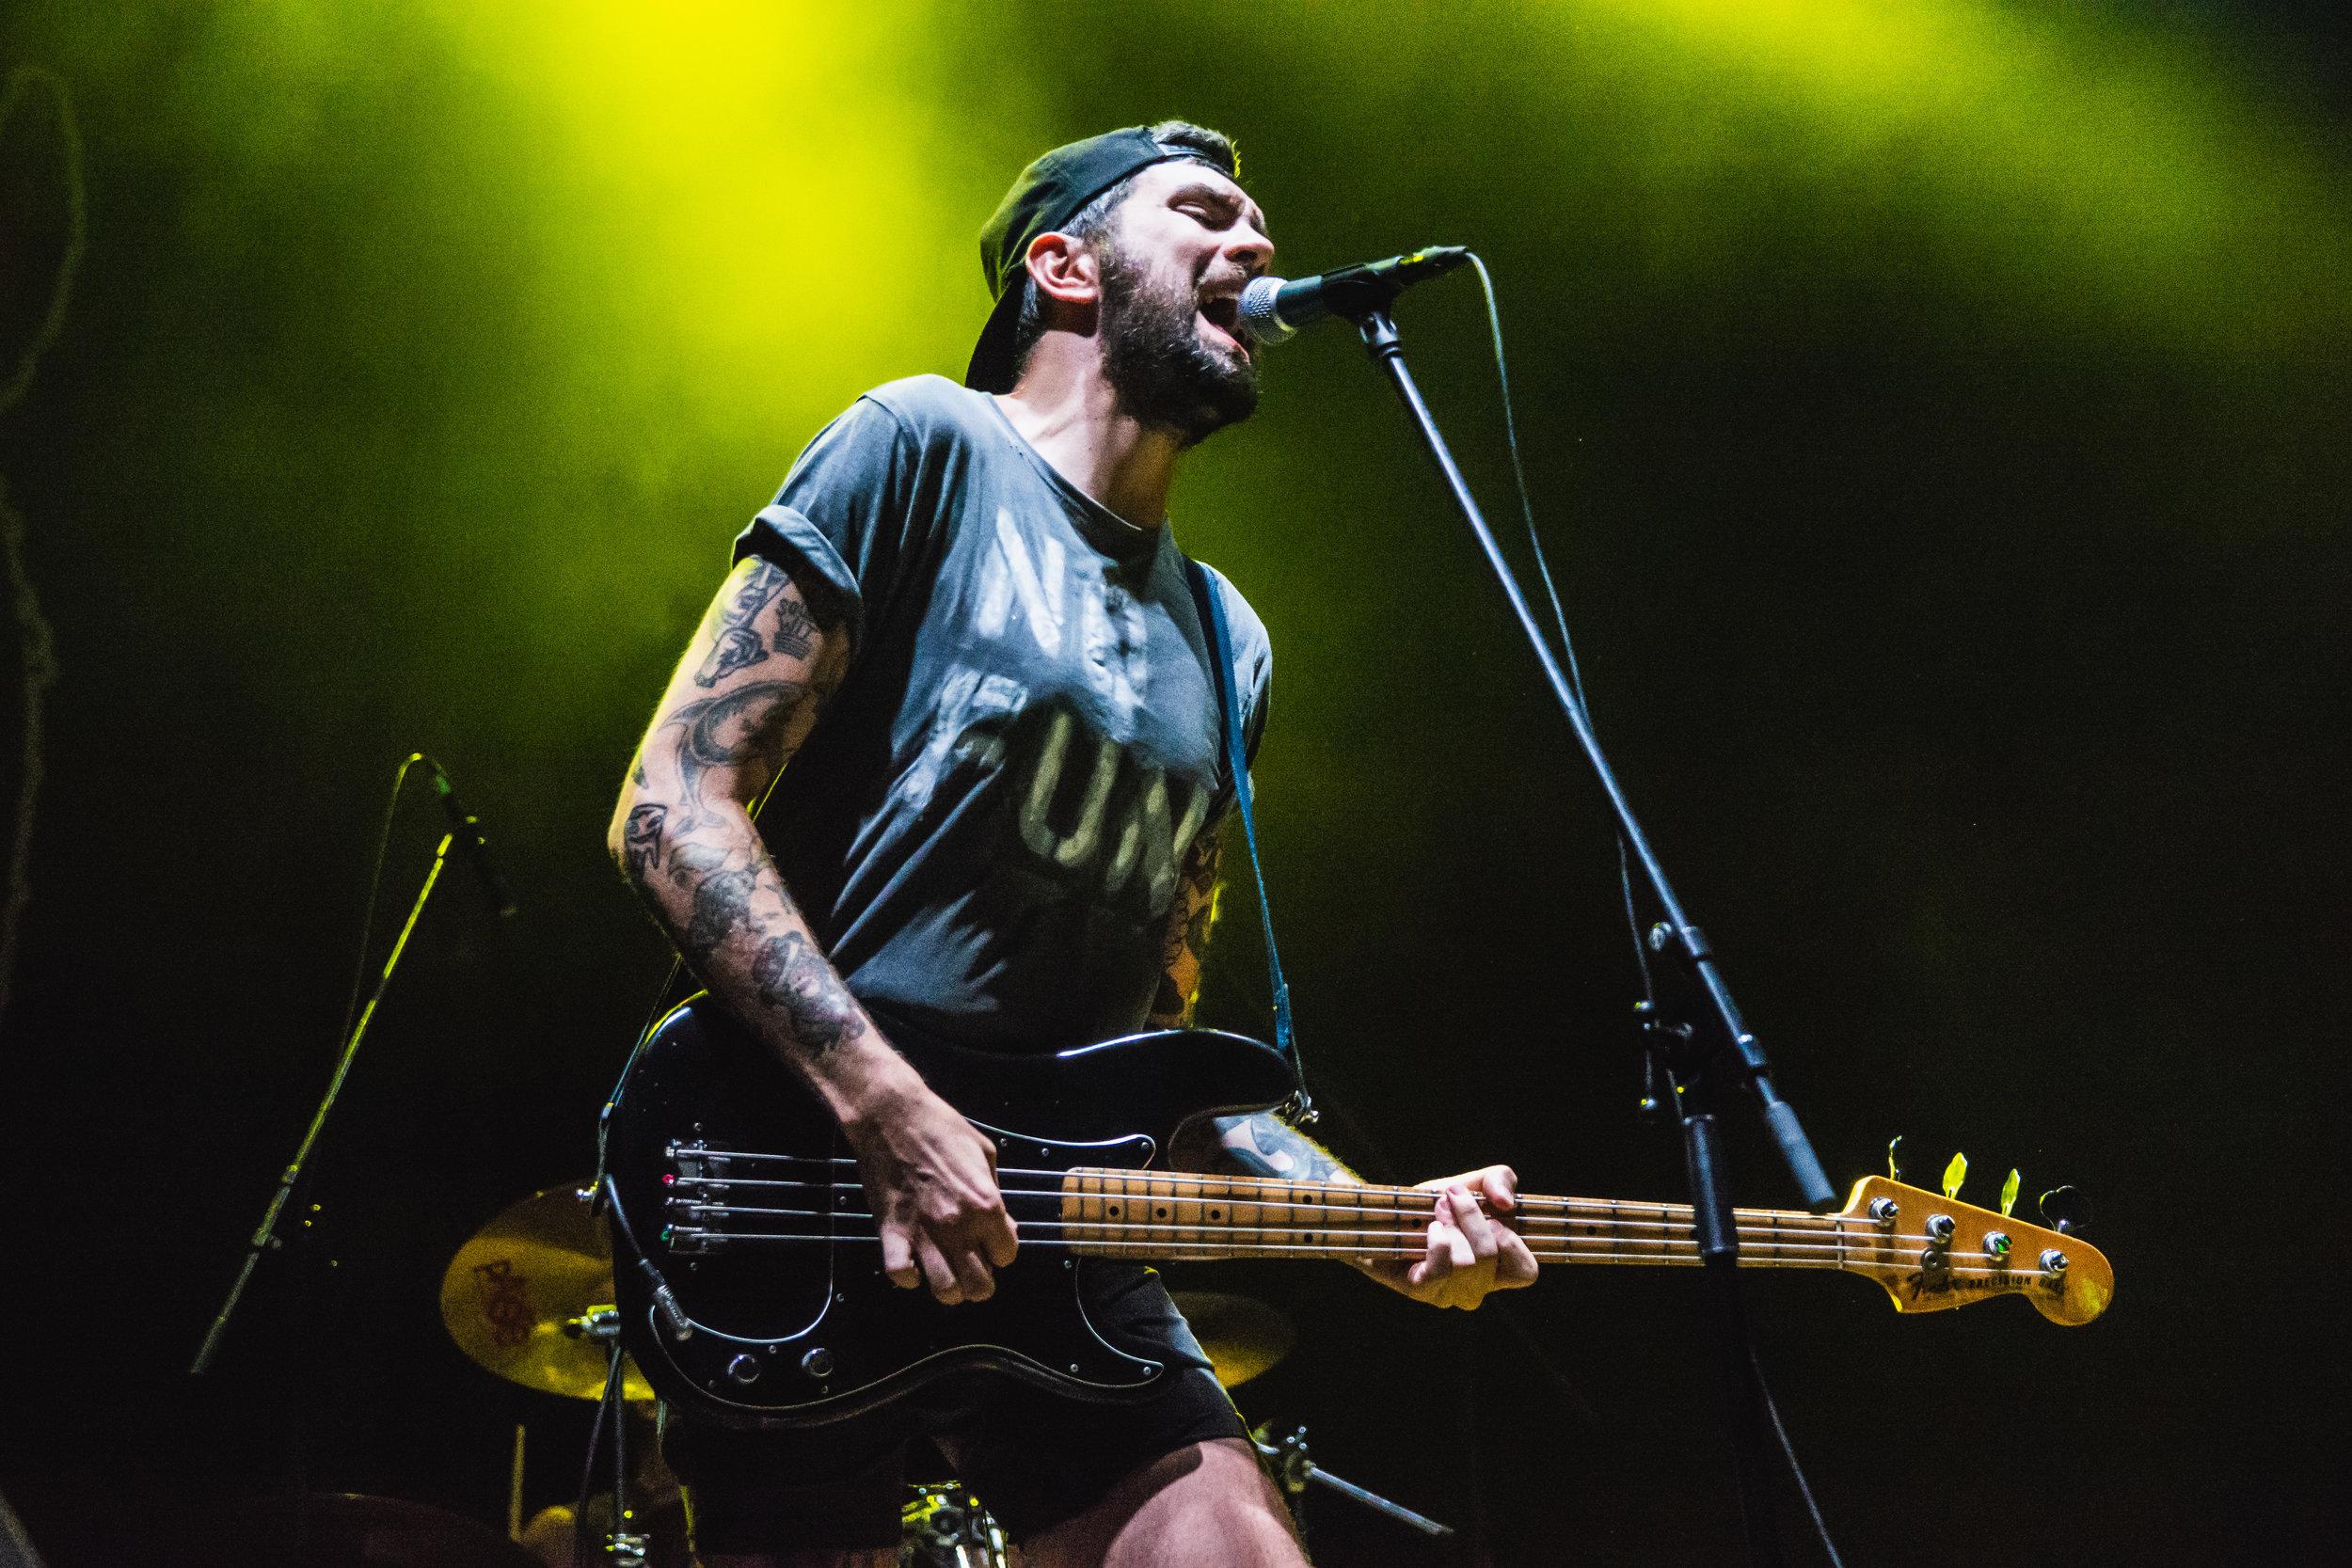 Punk-Rock-Holiday-Wednesday_89_2018August 08, 2018.jpg